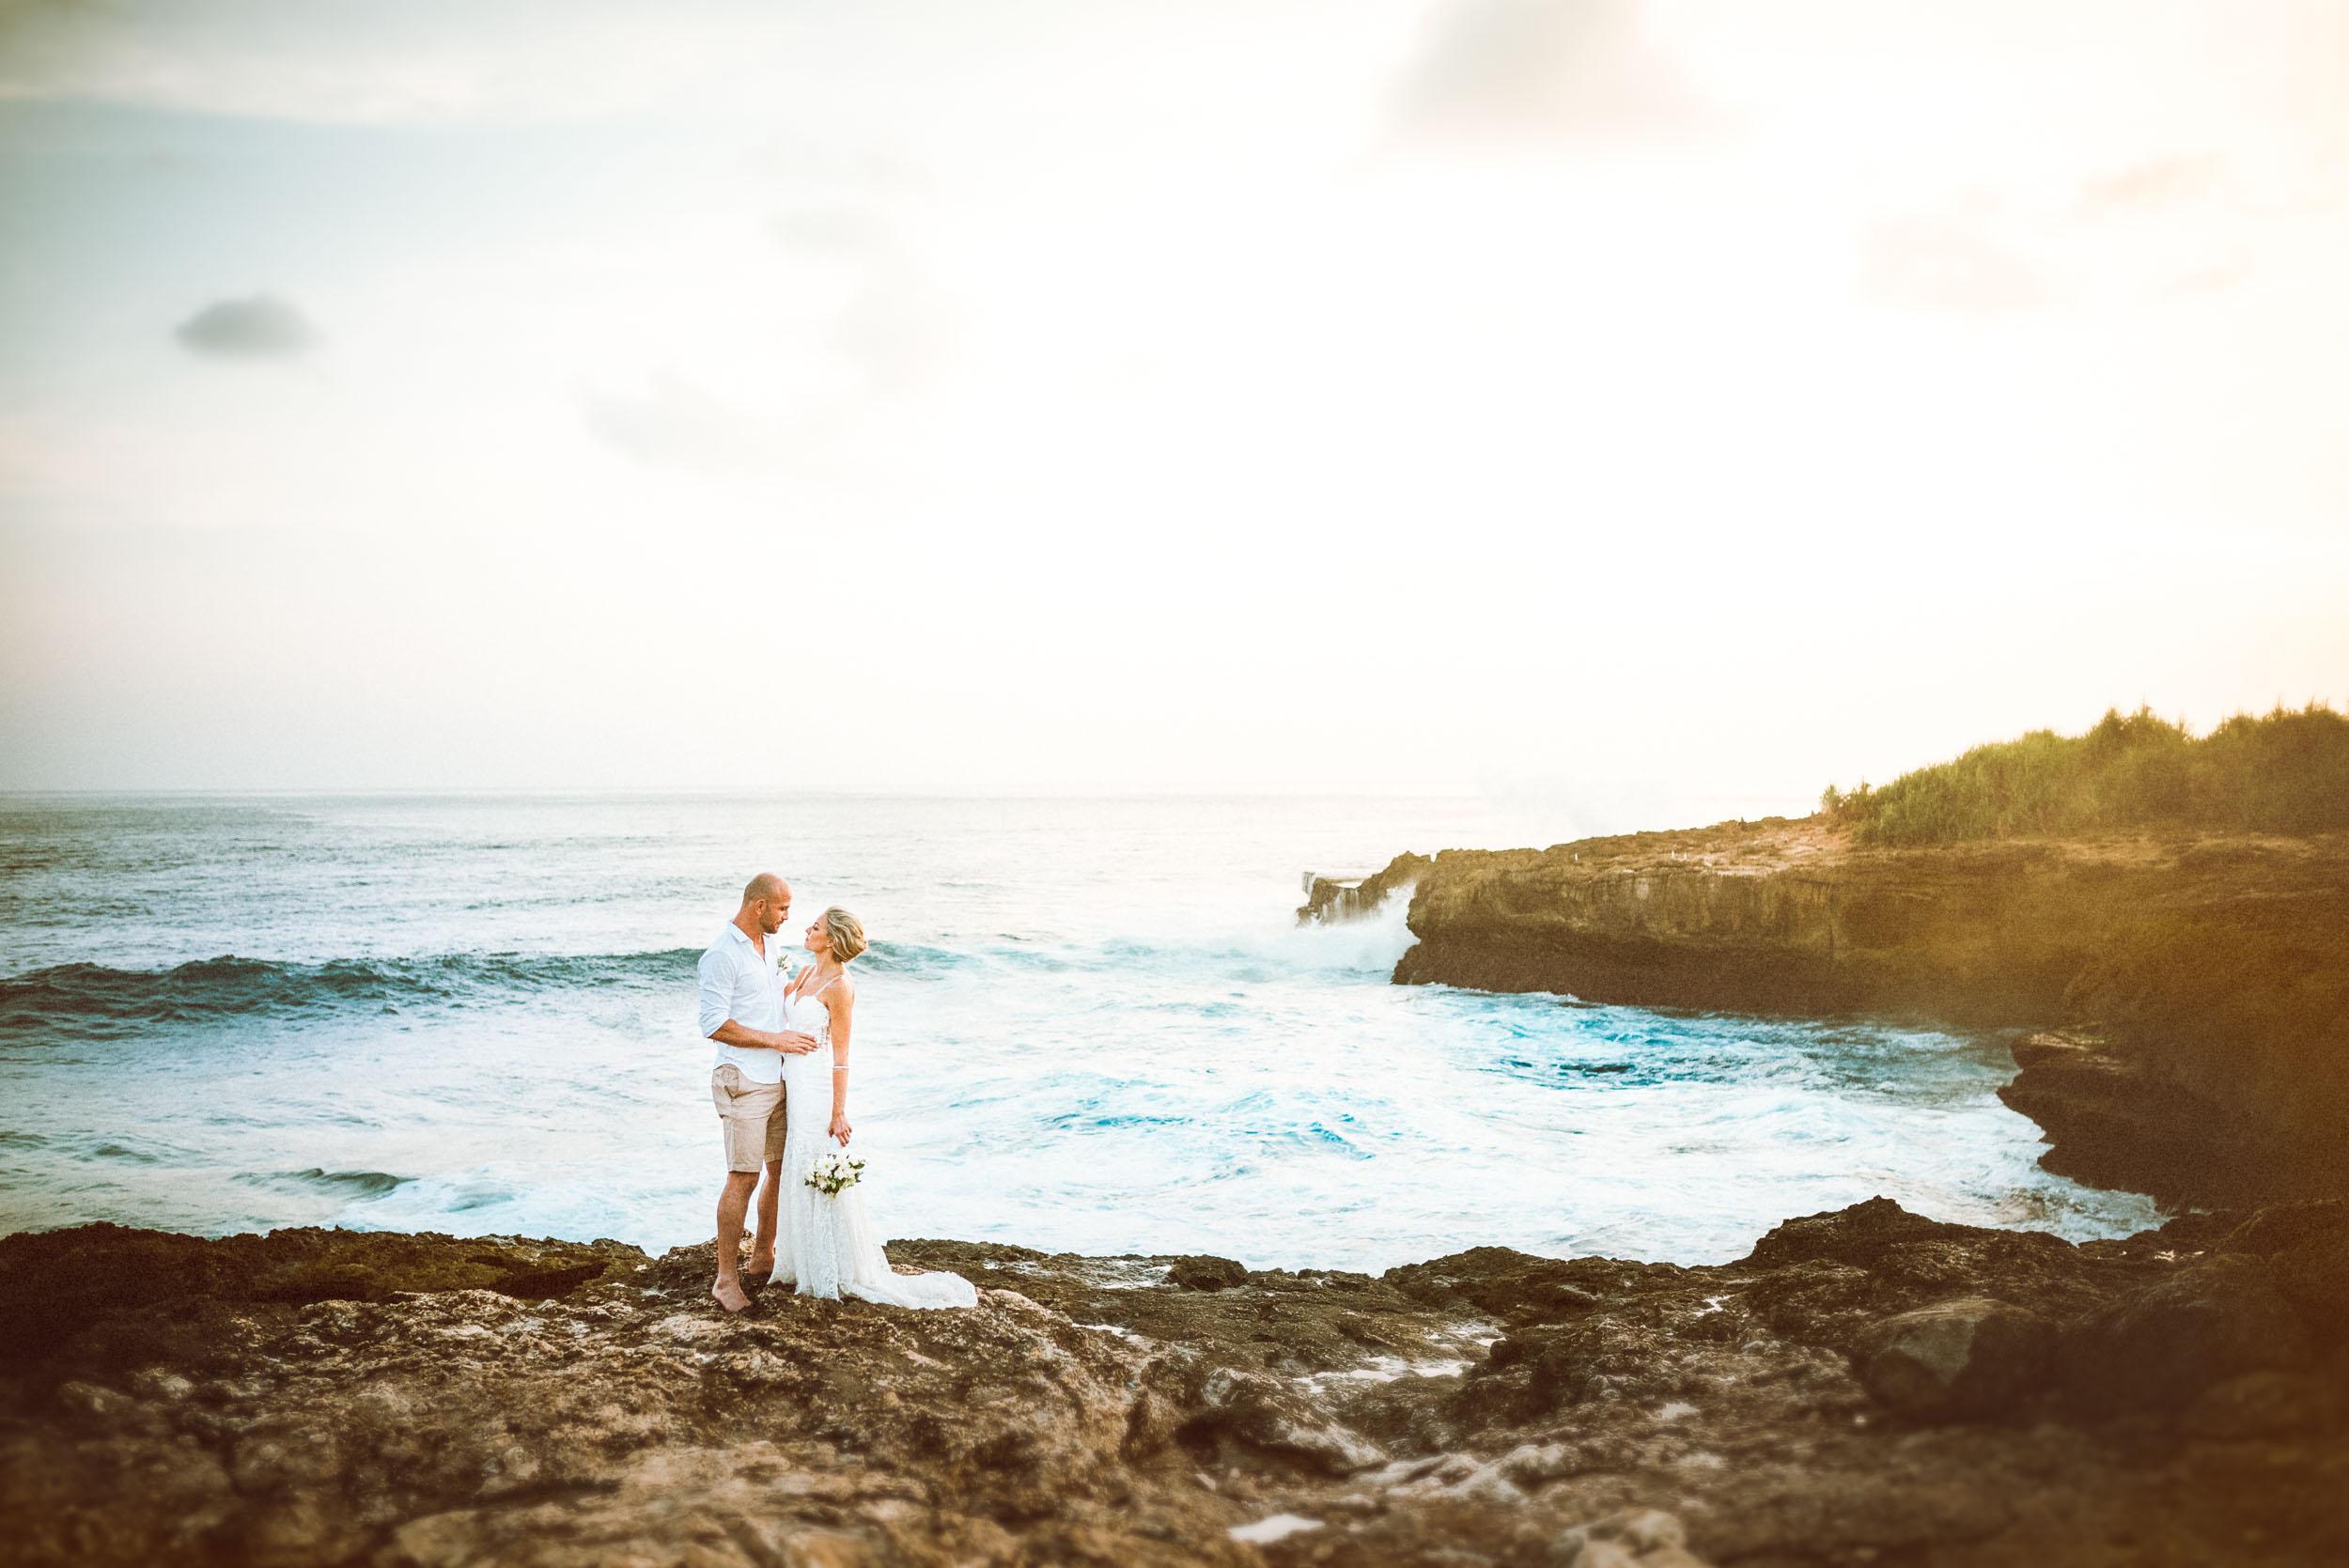 The Raw Photographer - Cairns Wedding Photographer - Bali Ubud Destination Photography - Travel - Australia - Asia Wed Photo Portrait-11.jpg